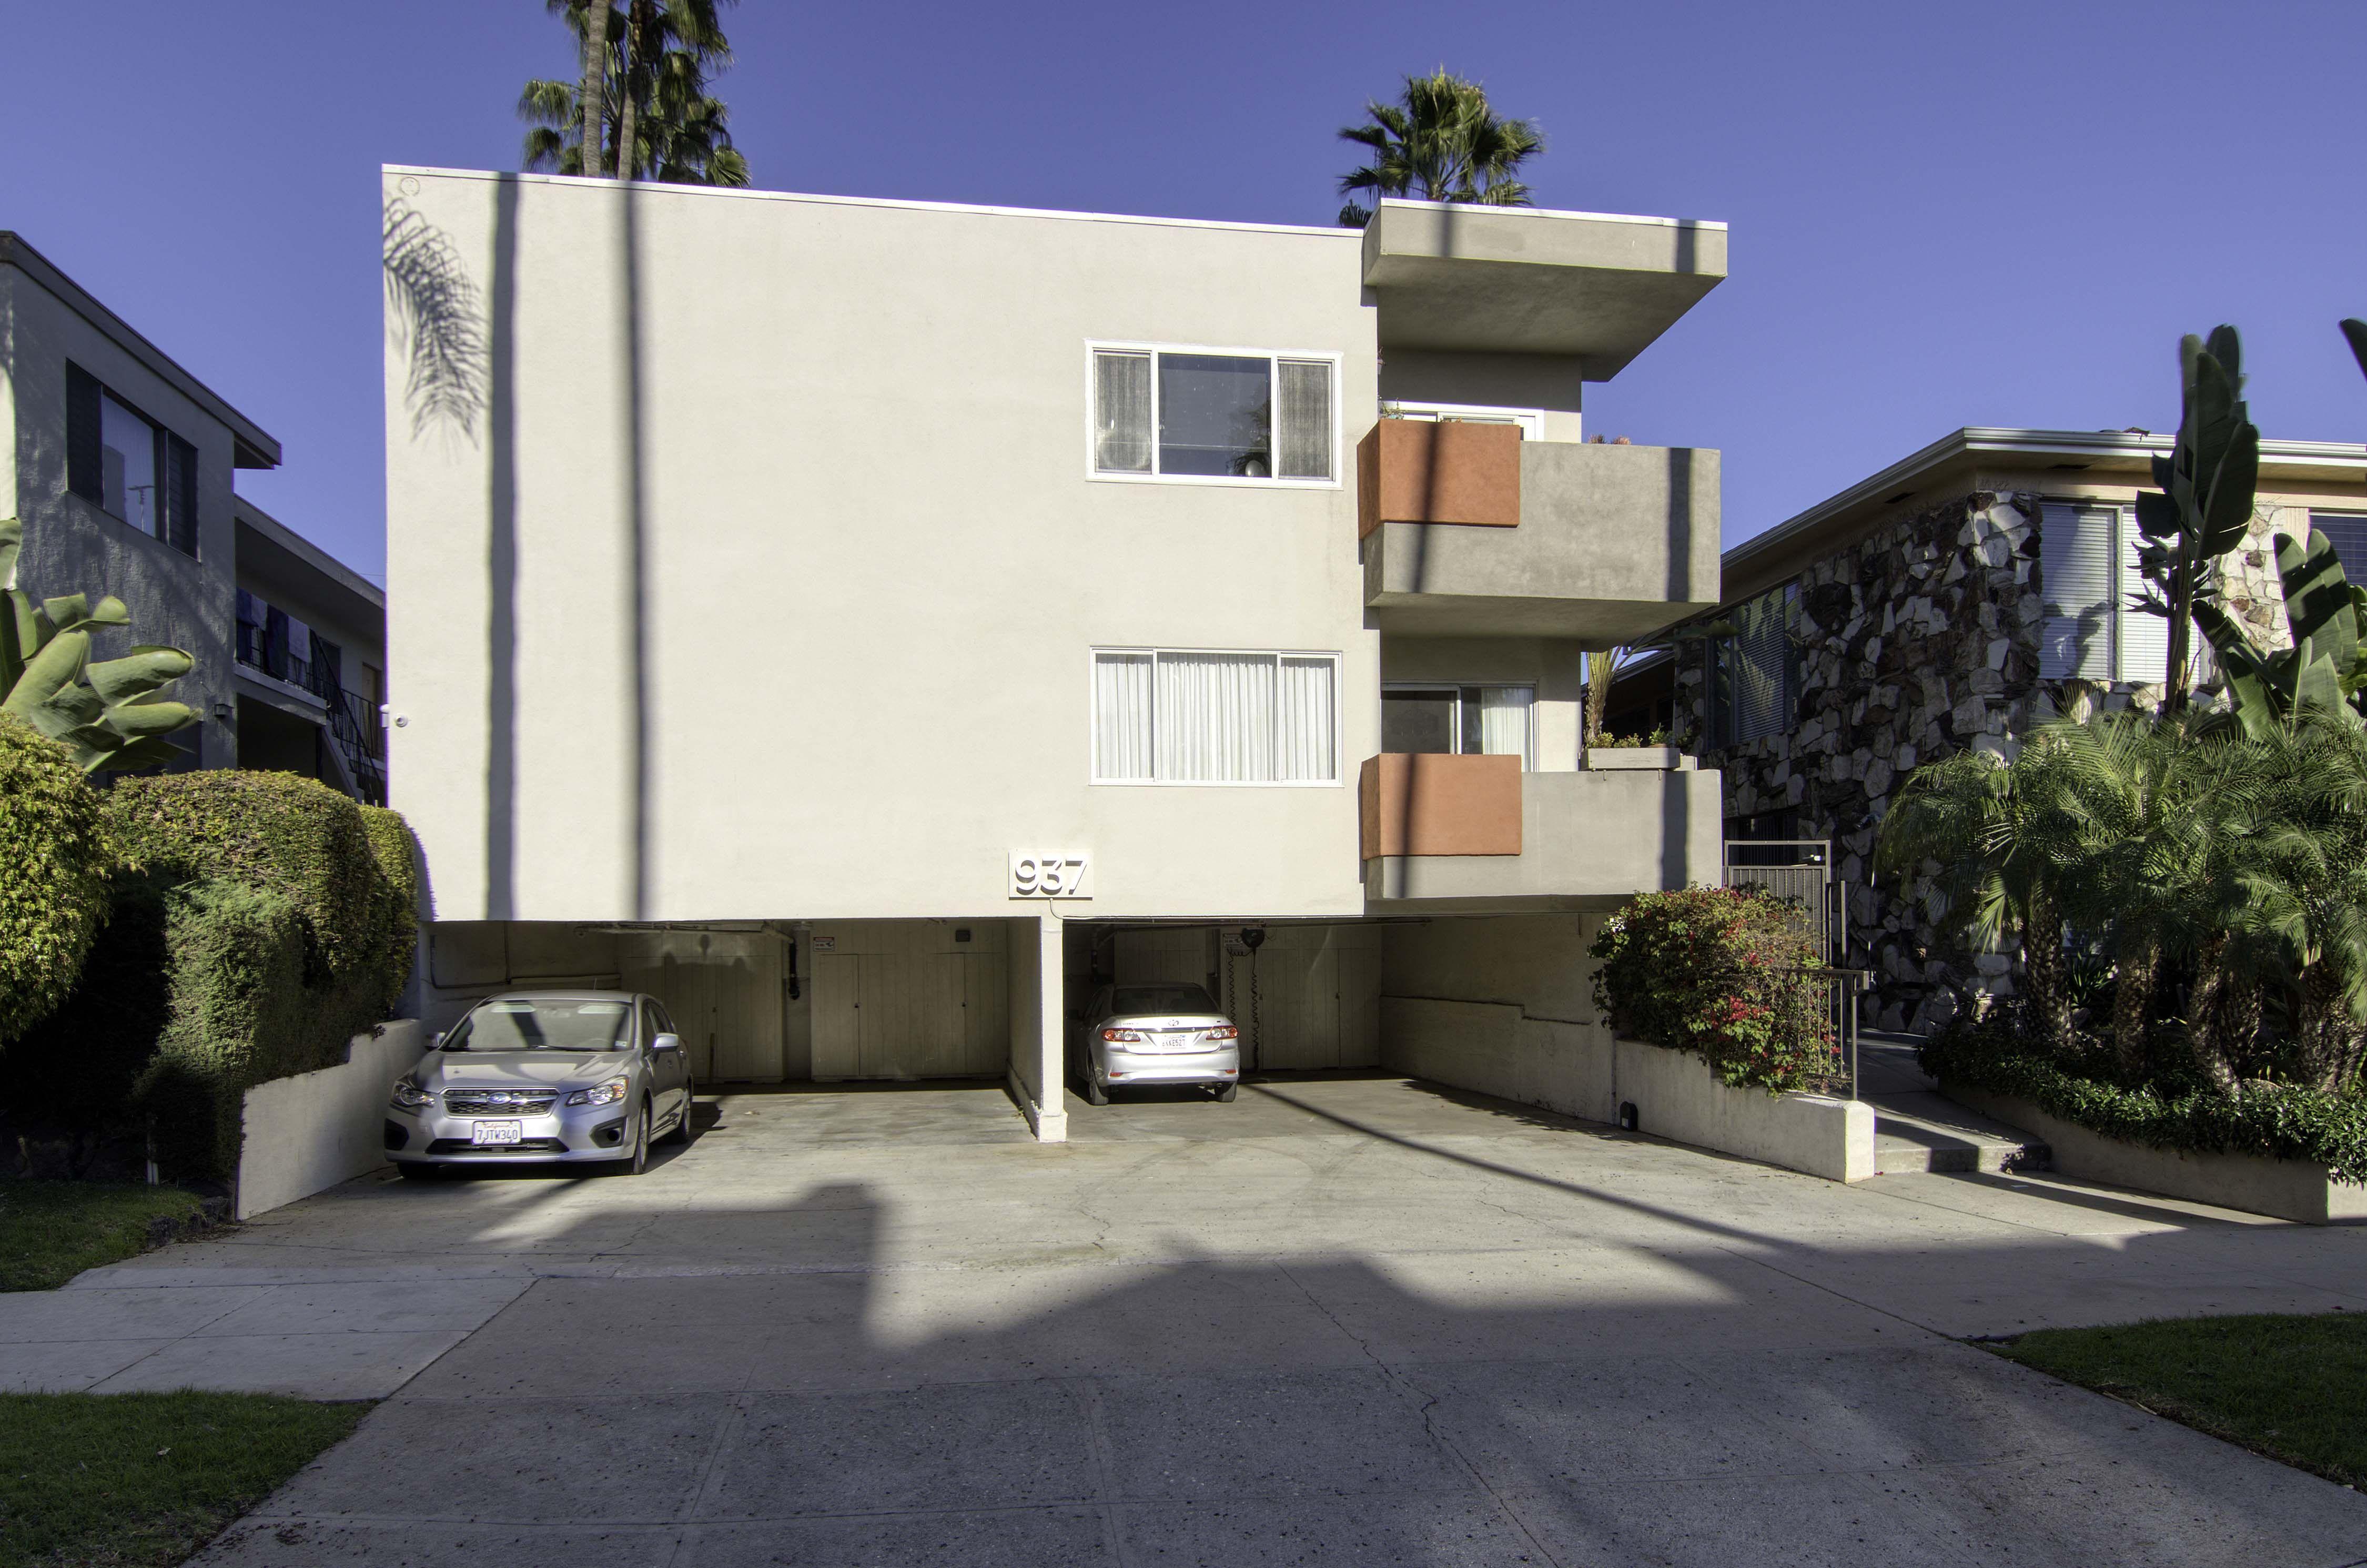 937 5th St 10 Santa Monica House Styles Santa Monica California